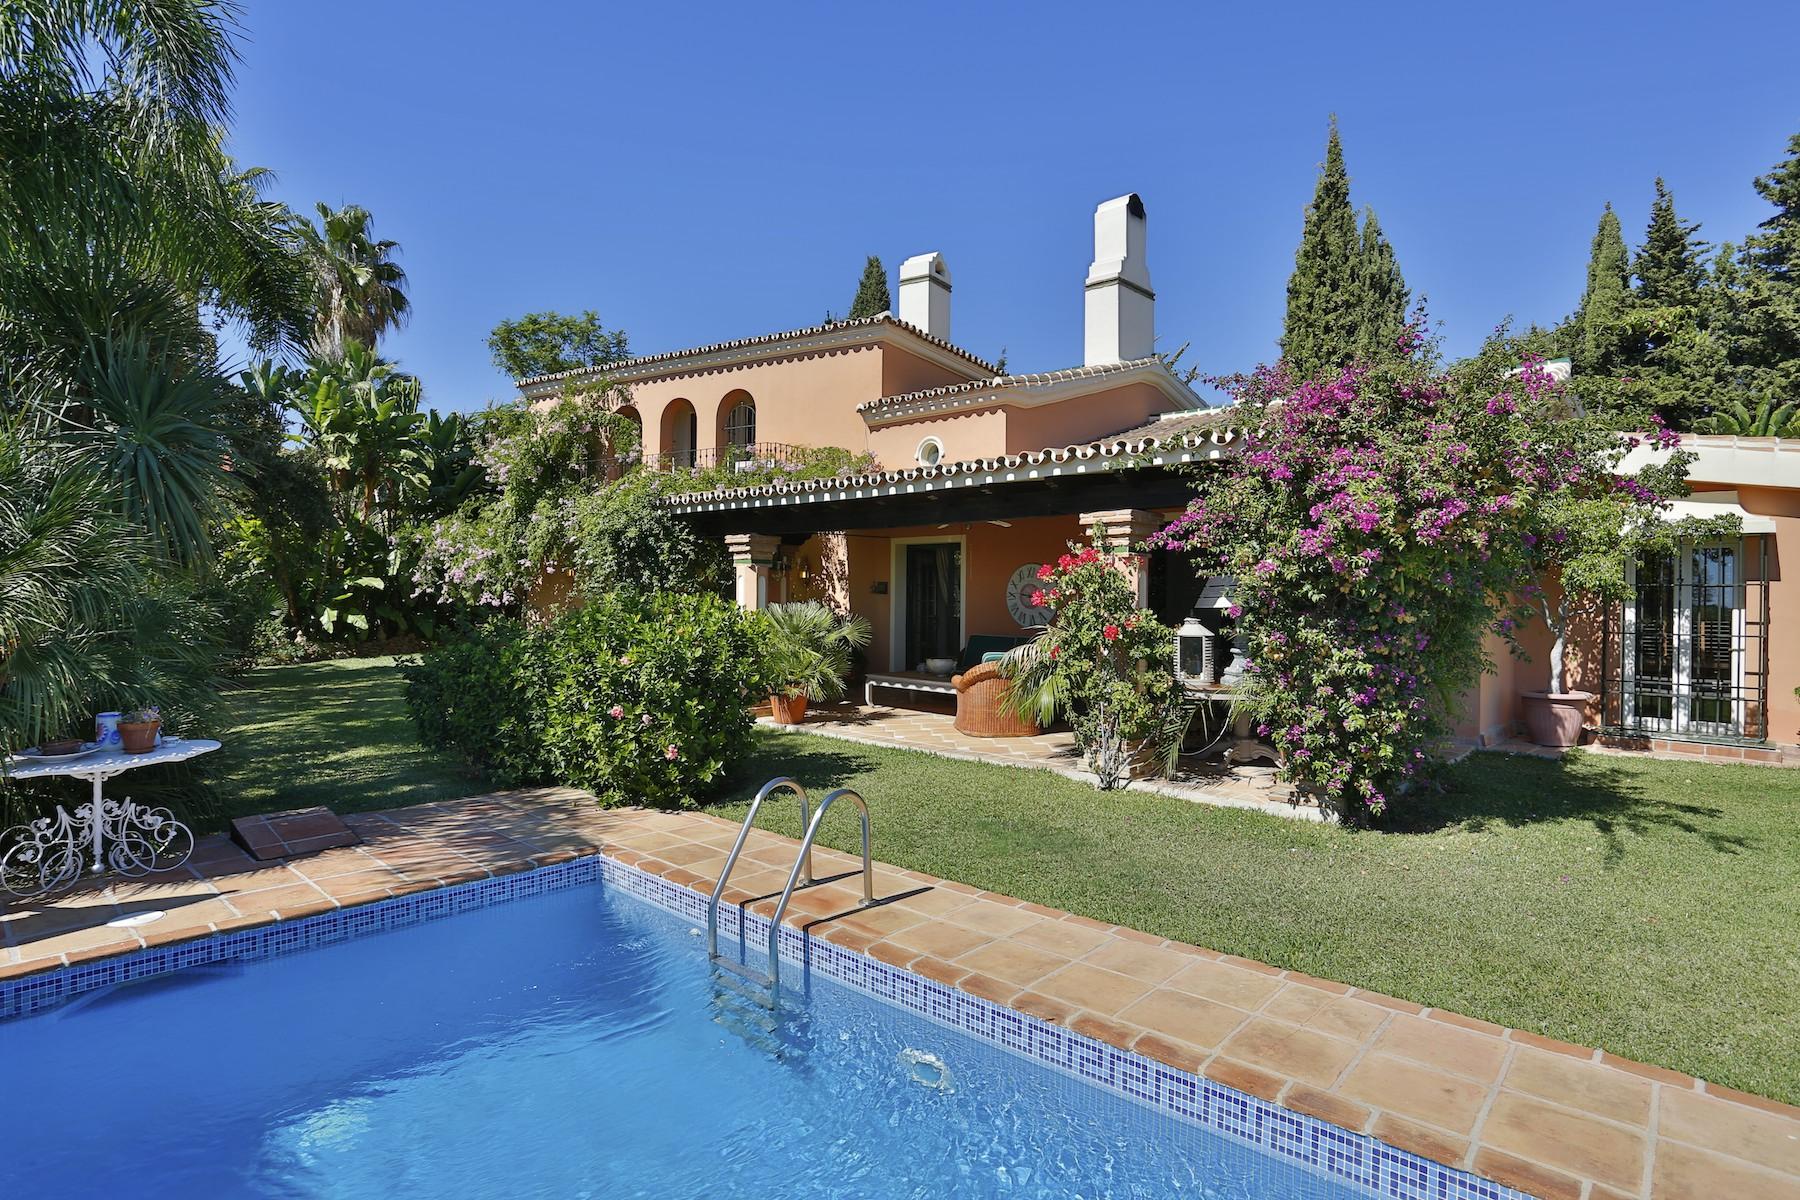 Maison unifamiliale pour l Vente à LA QUINTA BENAHAVIS Other Costa Del Sol, Costa Del Sol, 29679 Espagne